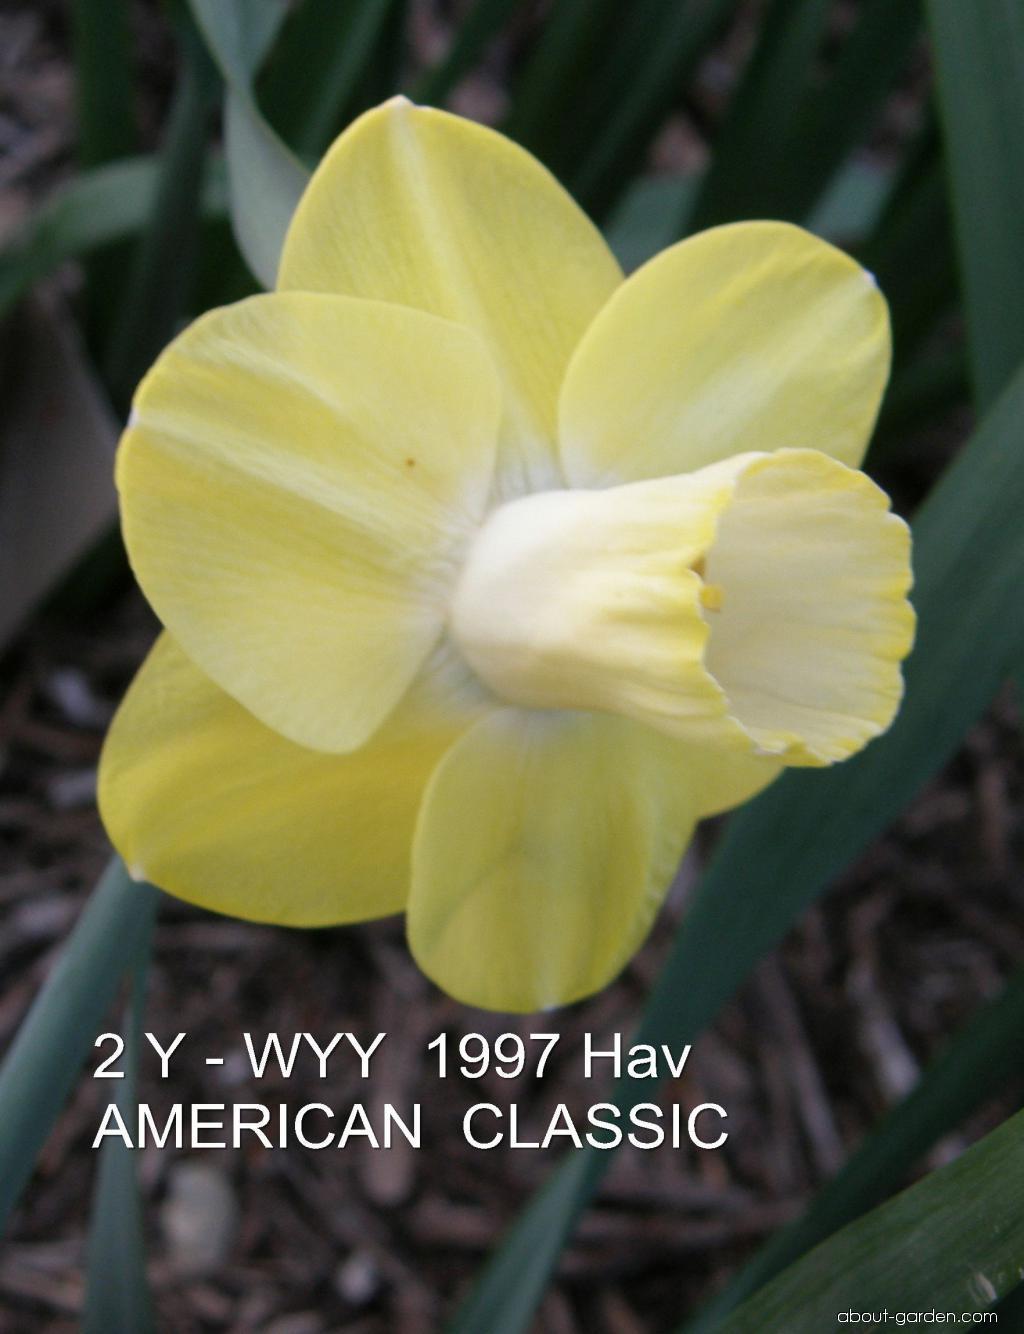 Daffodil - Narcissus American Classic